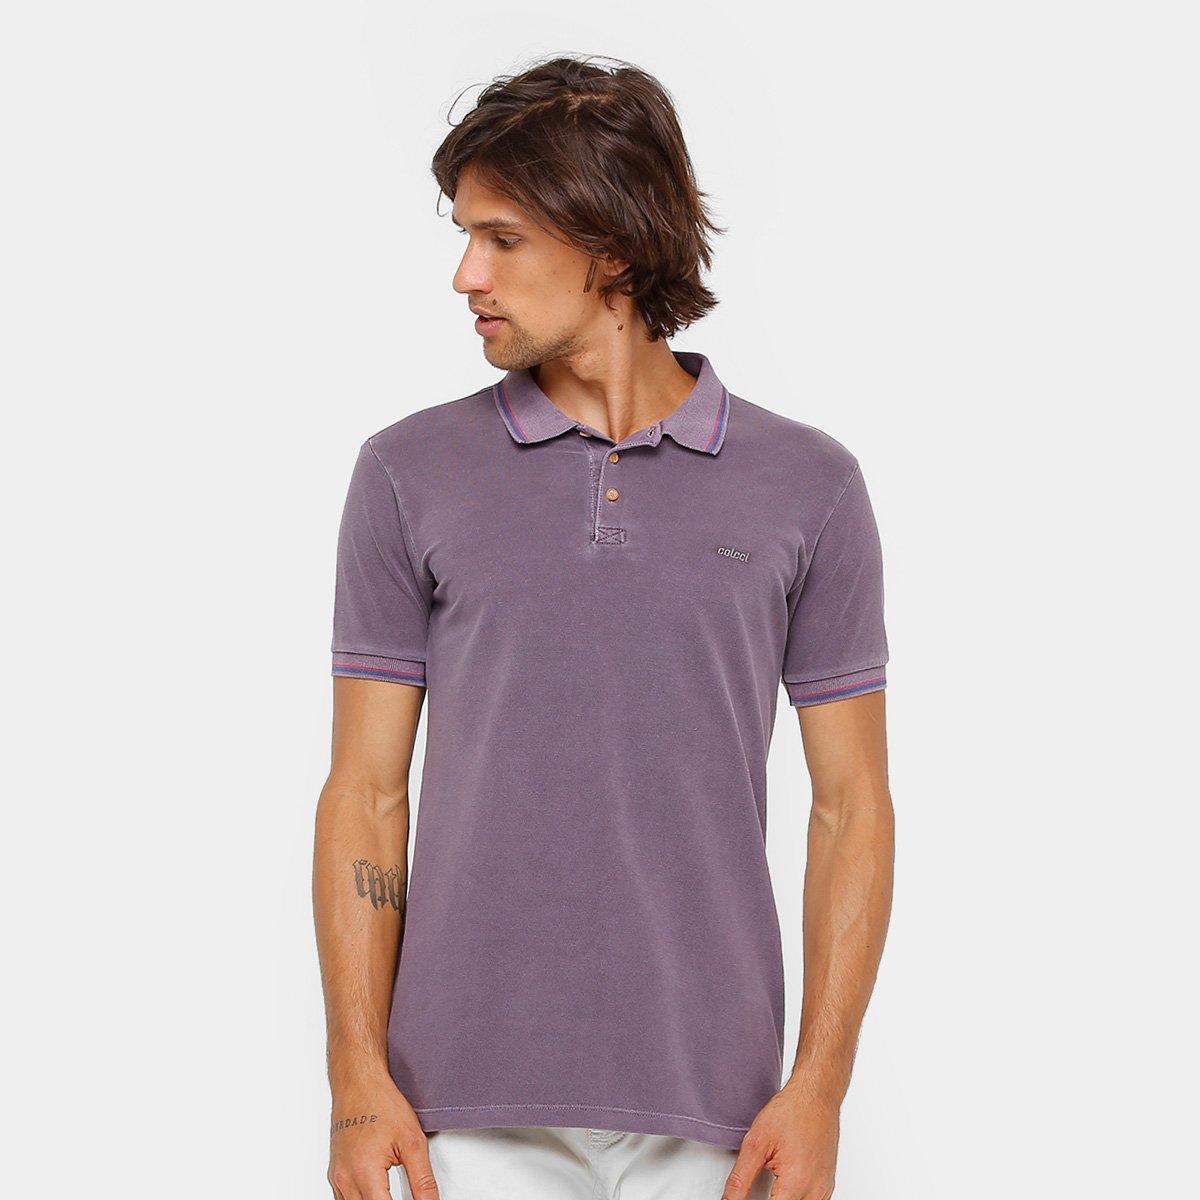 Camisa Polo Colcci Bordado Masculina - Compre Agora  fa8cd8bbea2f1